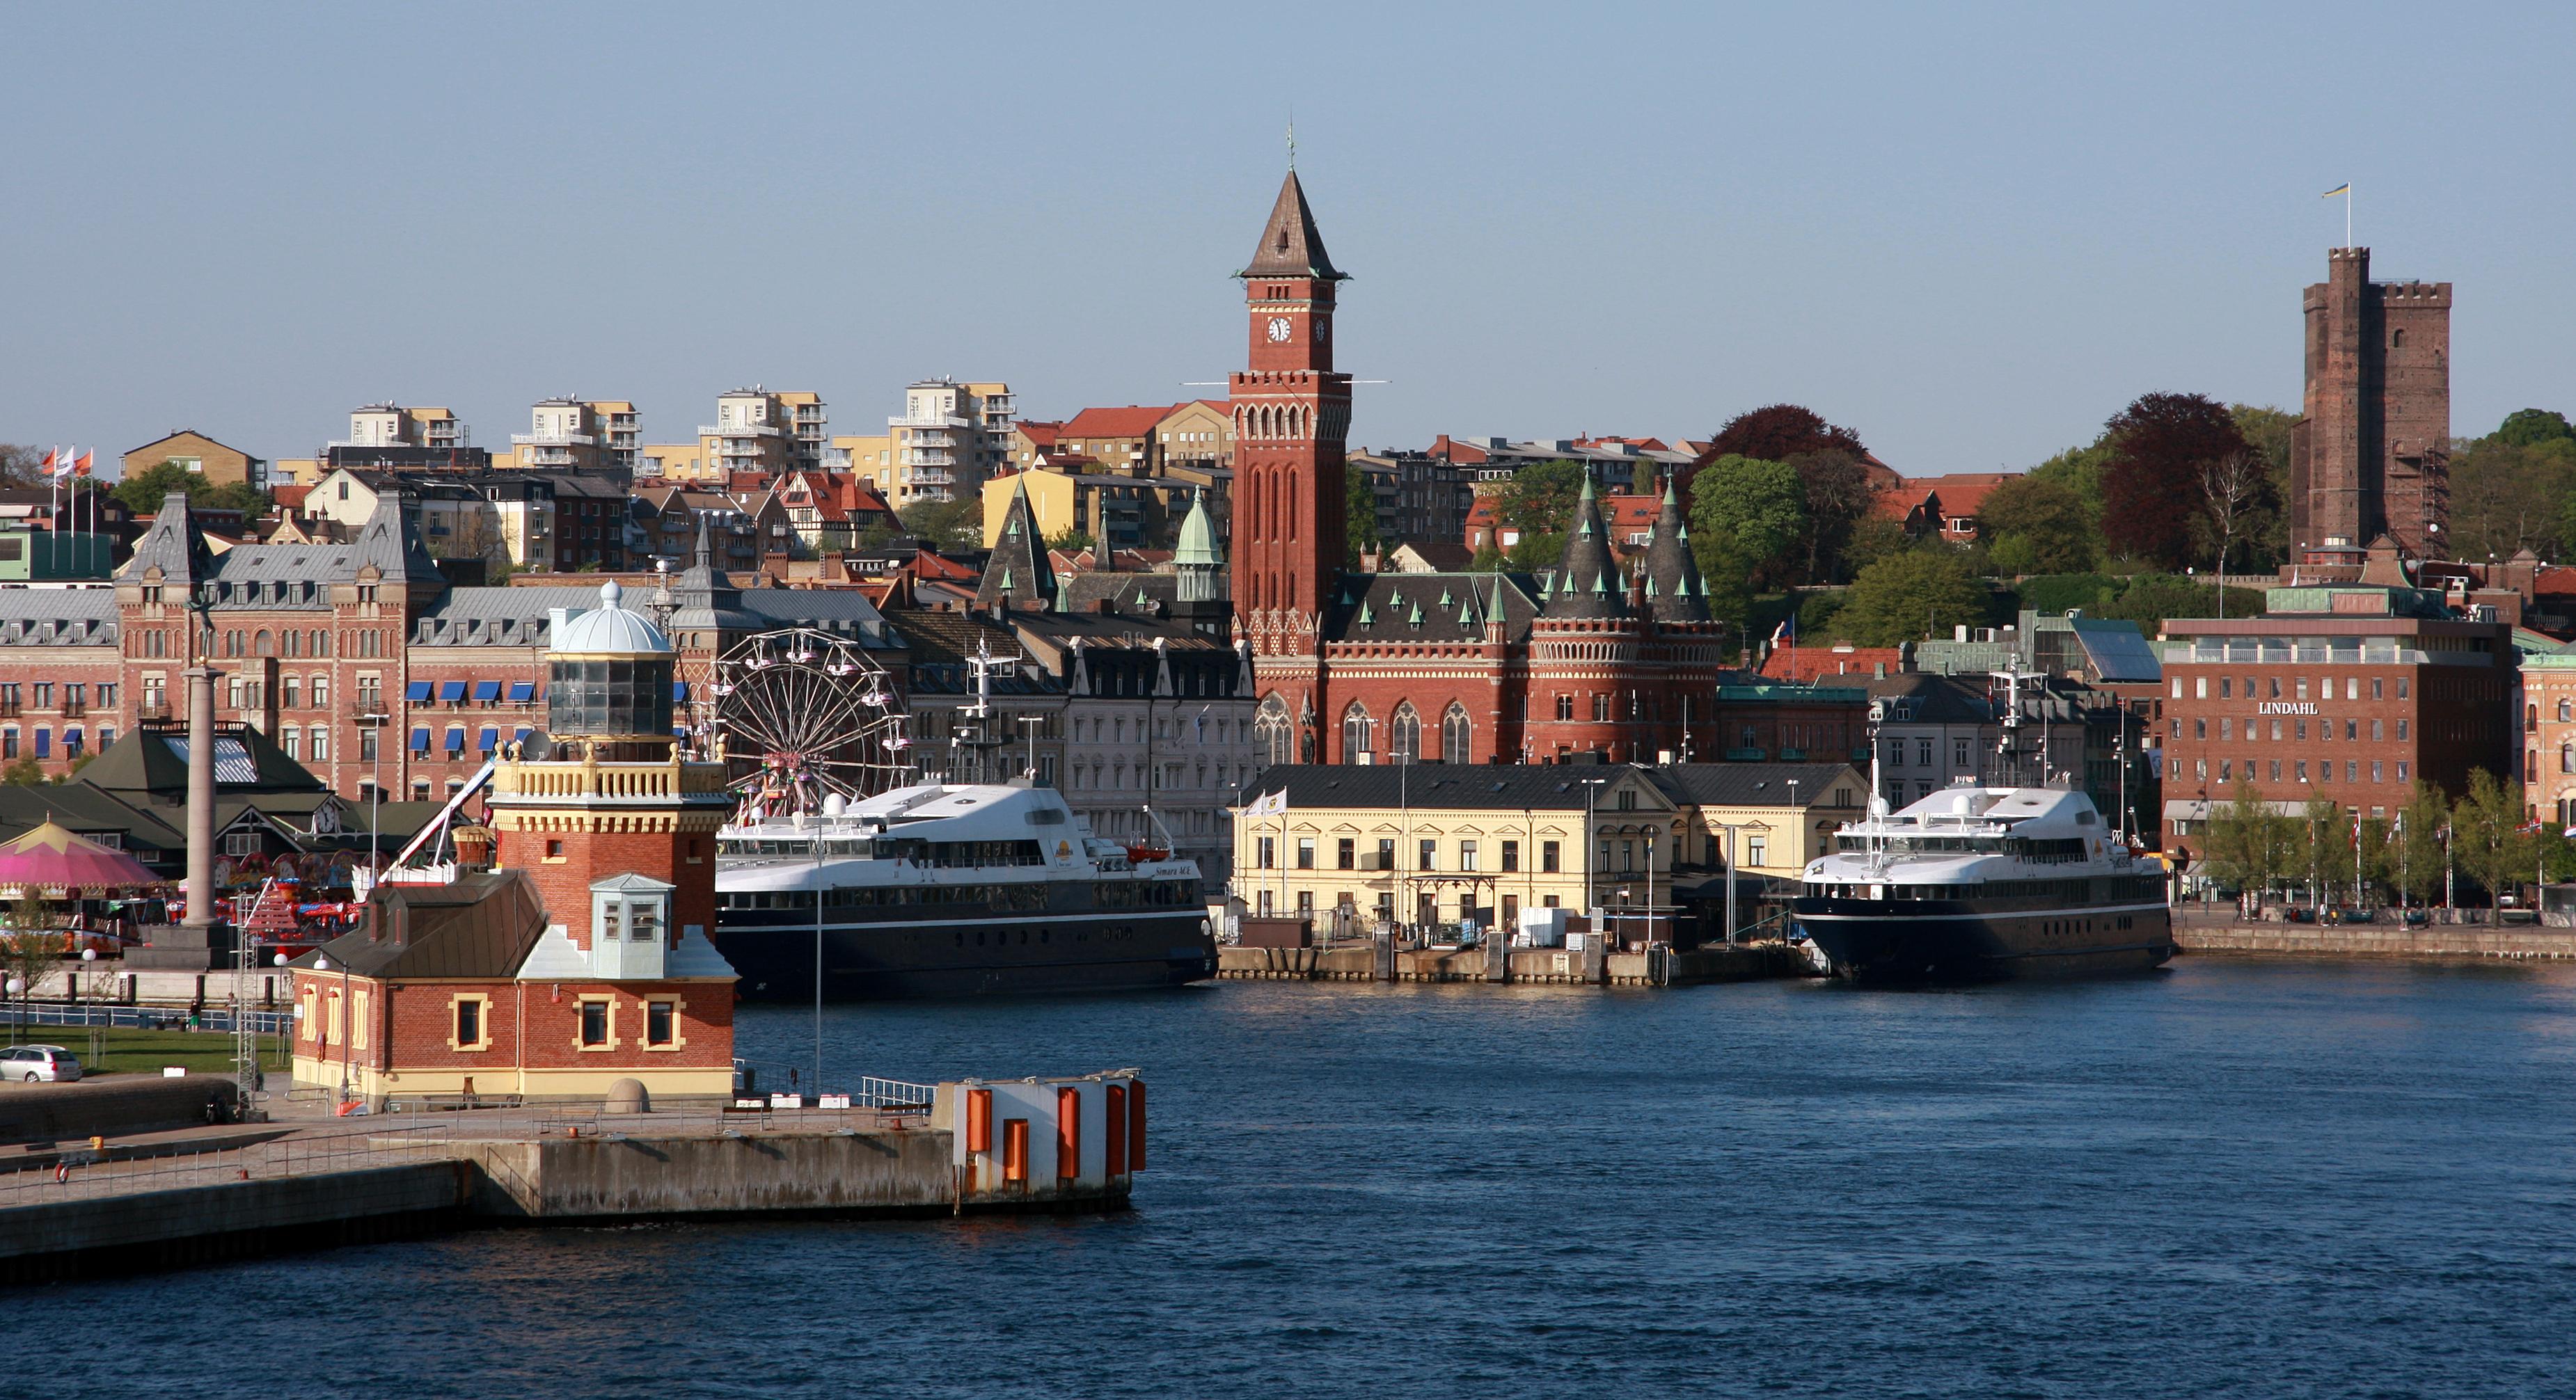 Helsingborg Sweden  city photo : Original file  3,701 × 2,012 pixels, file size: 5.83 MB, MIME ...